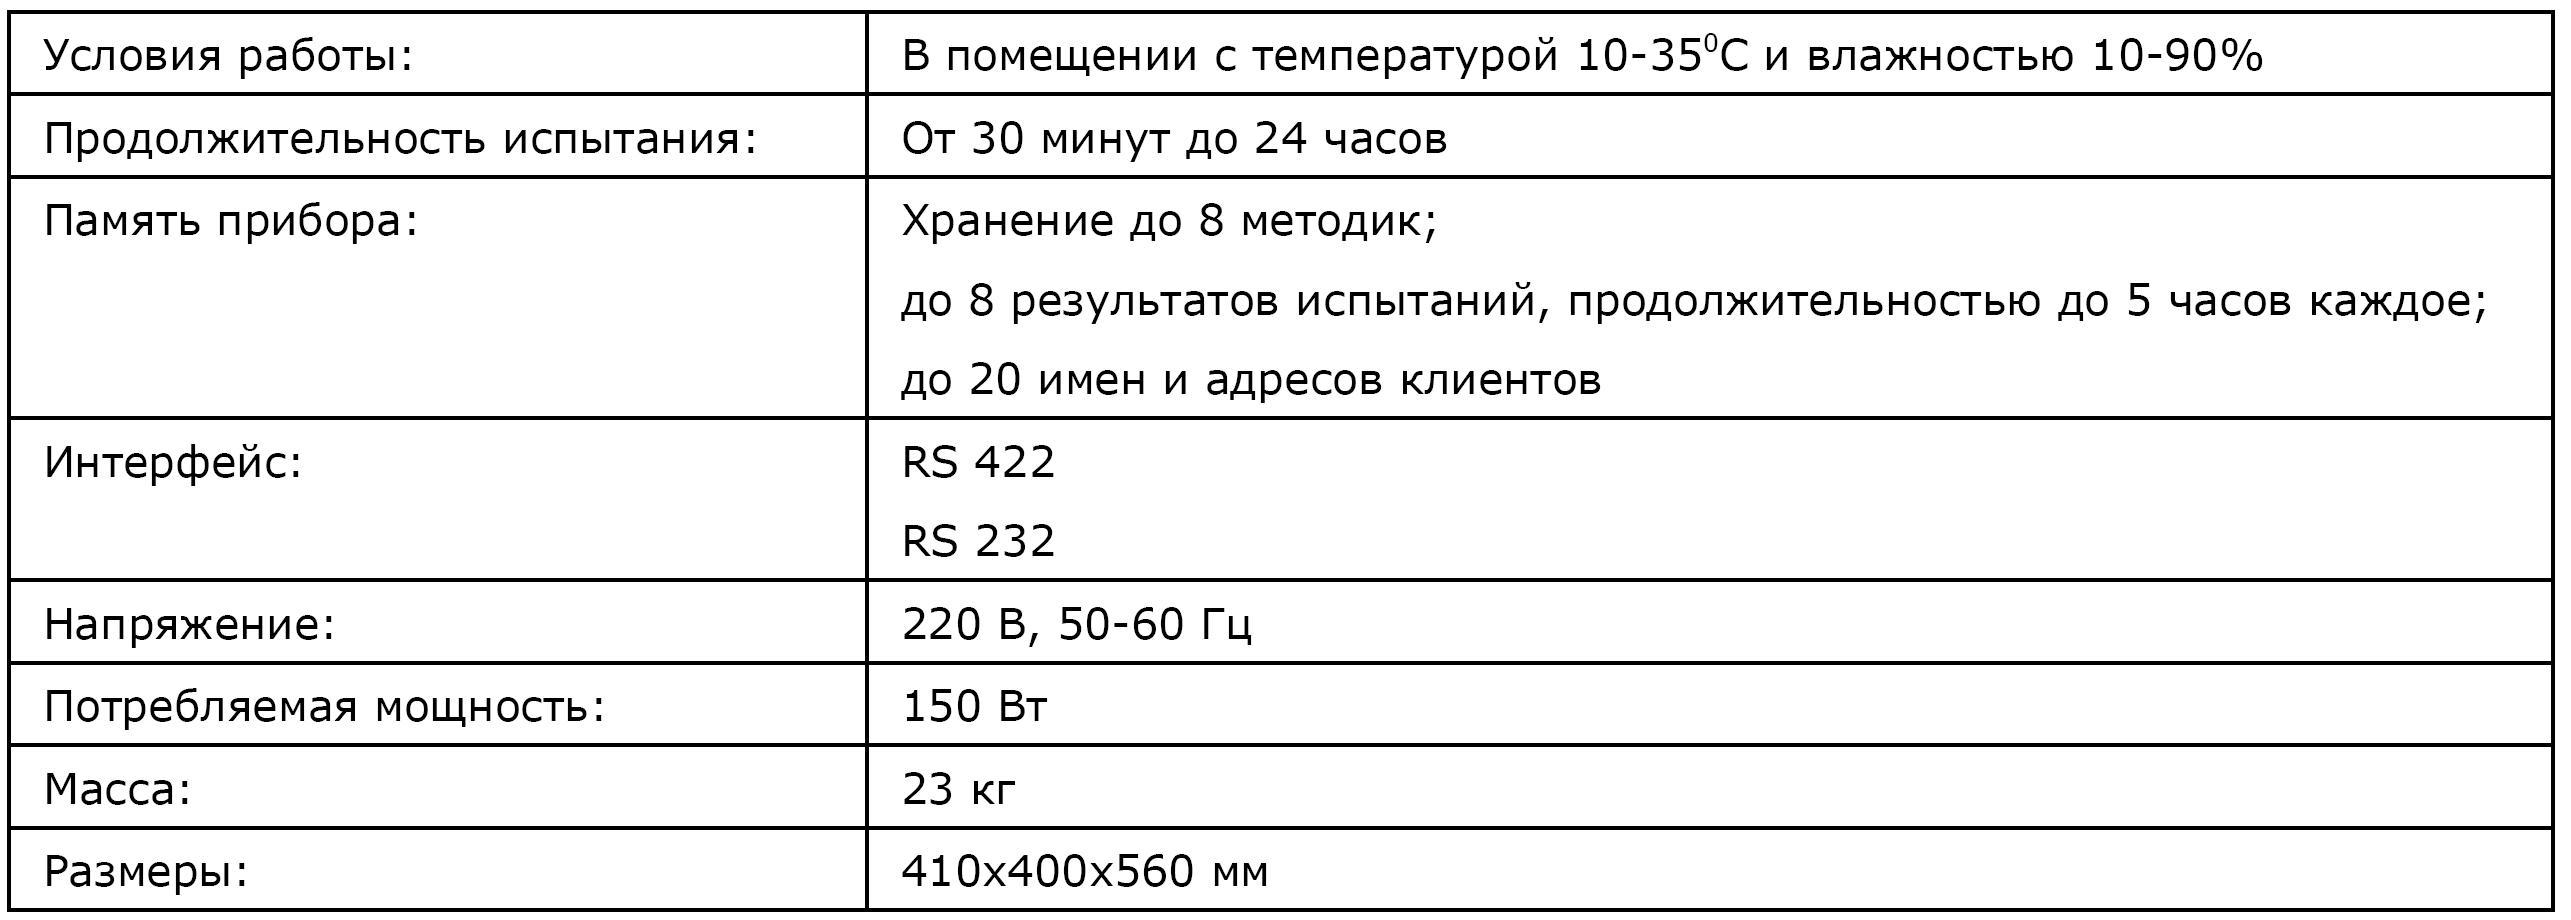 RHEOFERMENTOMETER F3